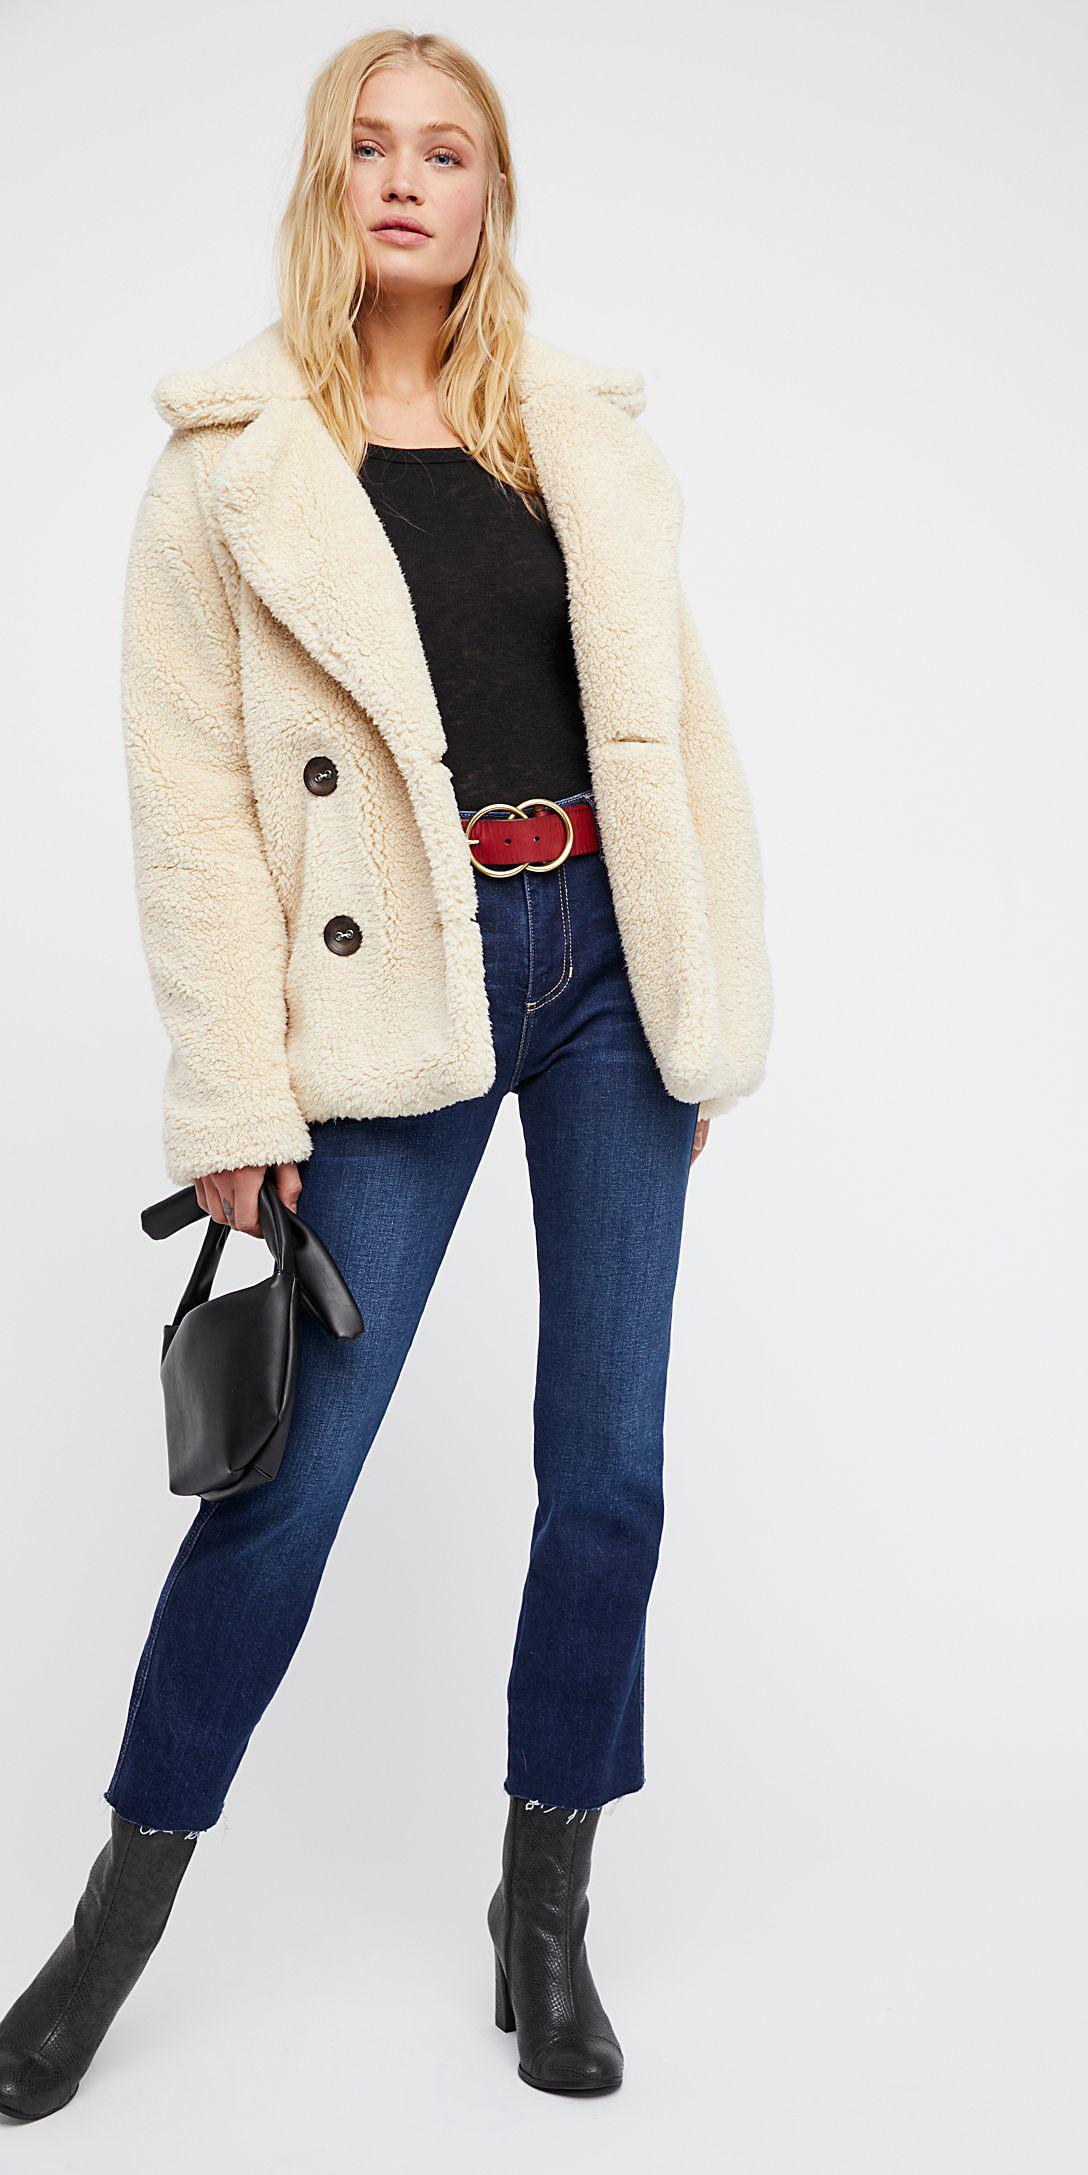 blue-navy-crop-jeans-belt-black-tee-black-shoe-booties-blonde-fur-white-jacket-coat-peacoat-fall-winter-lunch.jpg